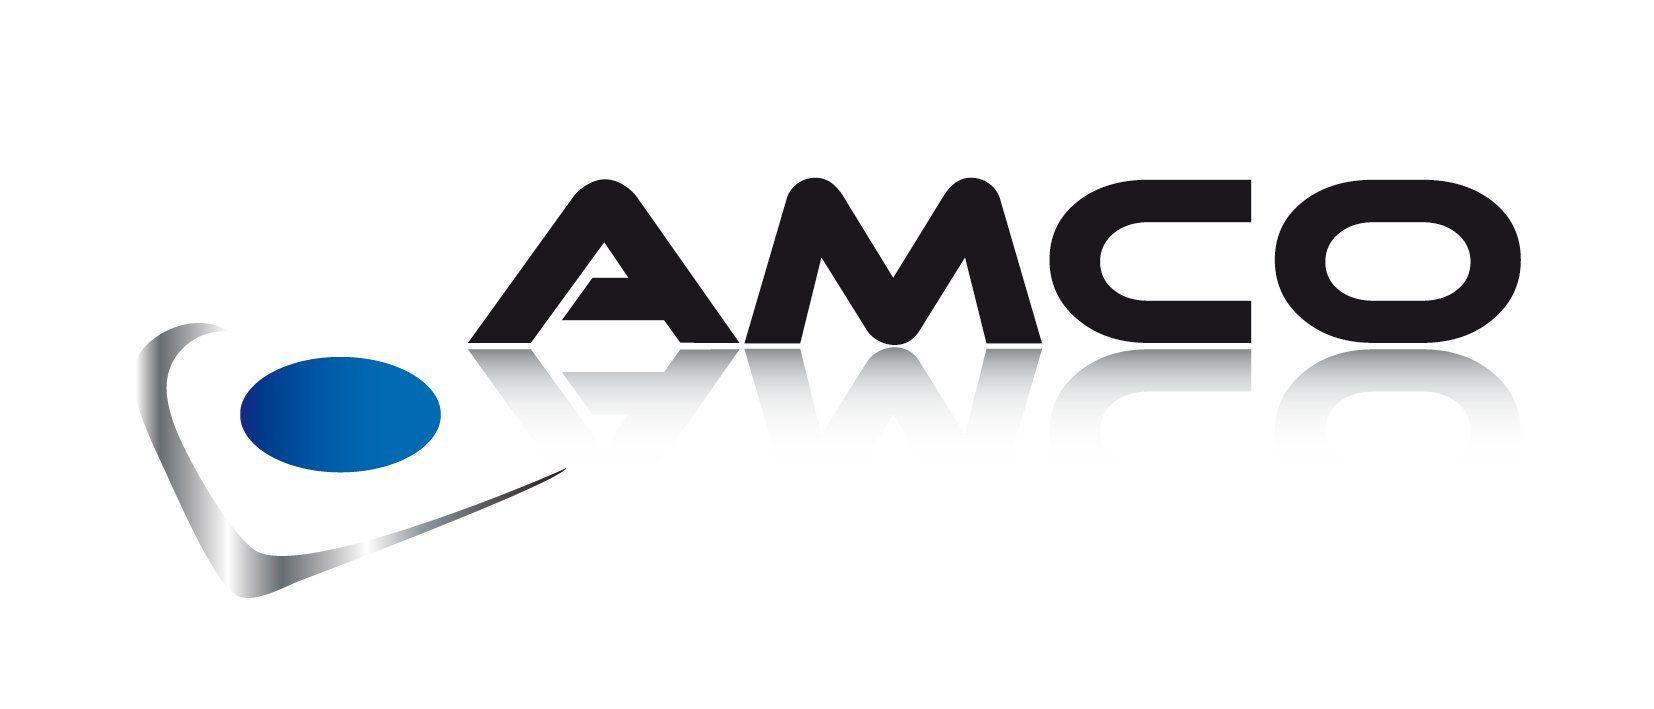 AMCO Les Escamotables - Fabricant